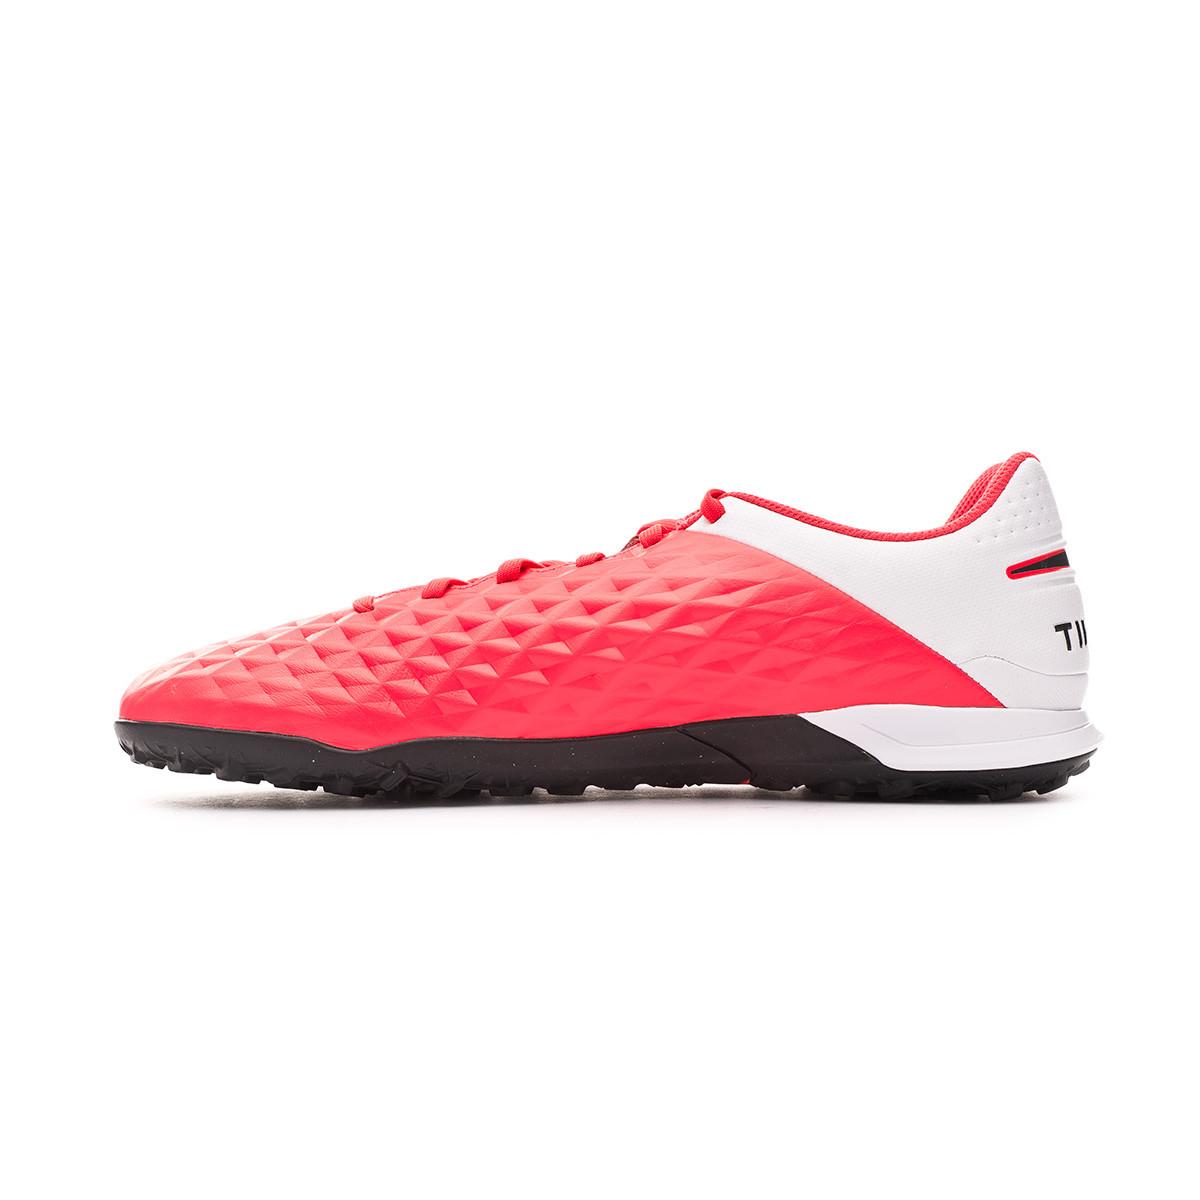 Sapatilhas Nike Tiempo Legend VIII Academy Turf